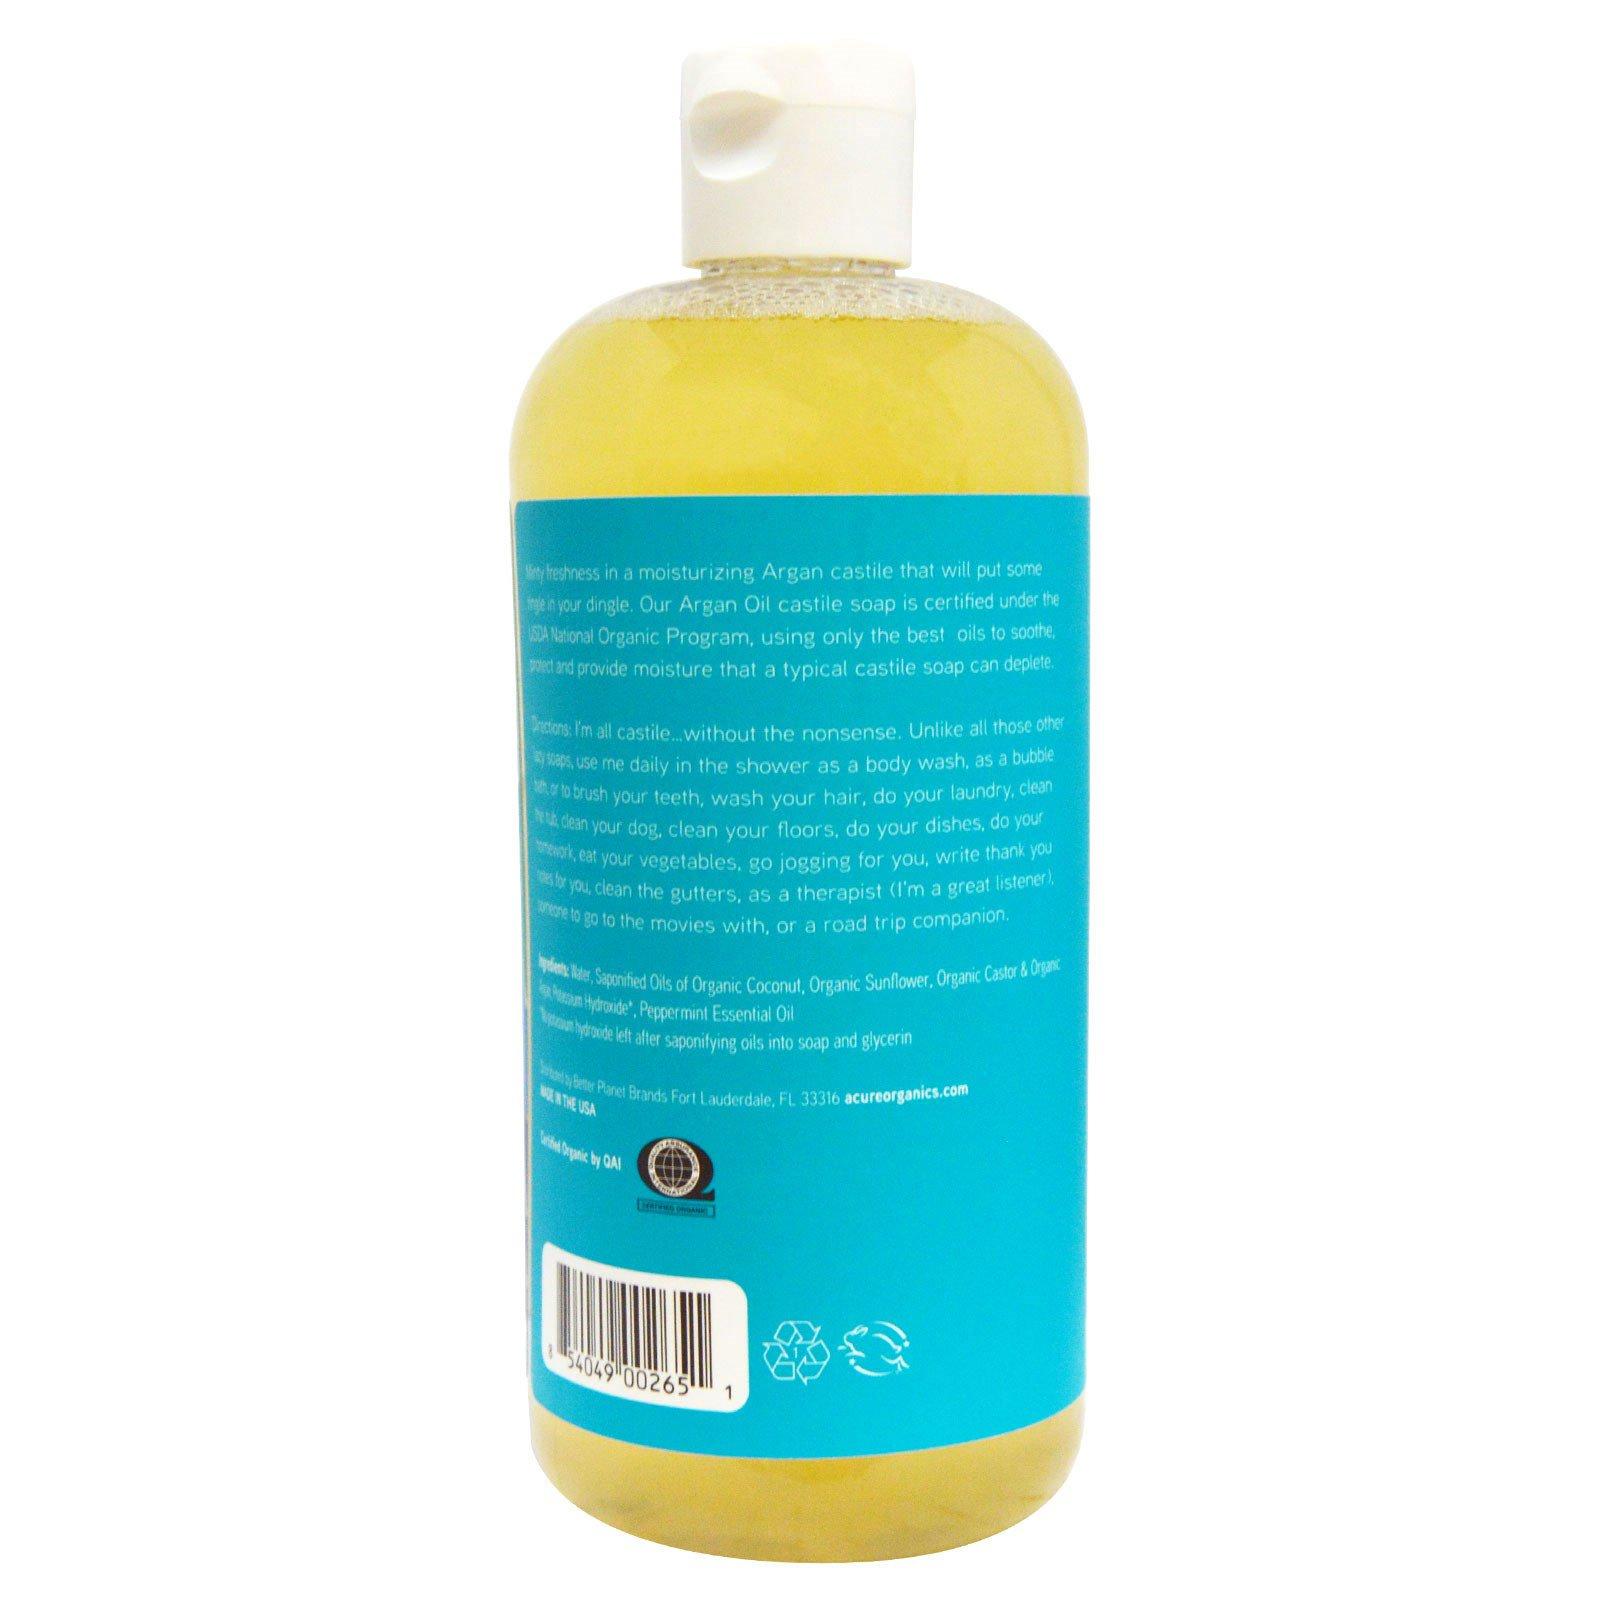 Acure, Argan Oil Castile Soap, Peppermint, 16 oz (473 1 ml) (Discontinued  Item)